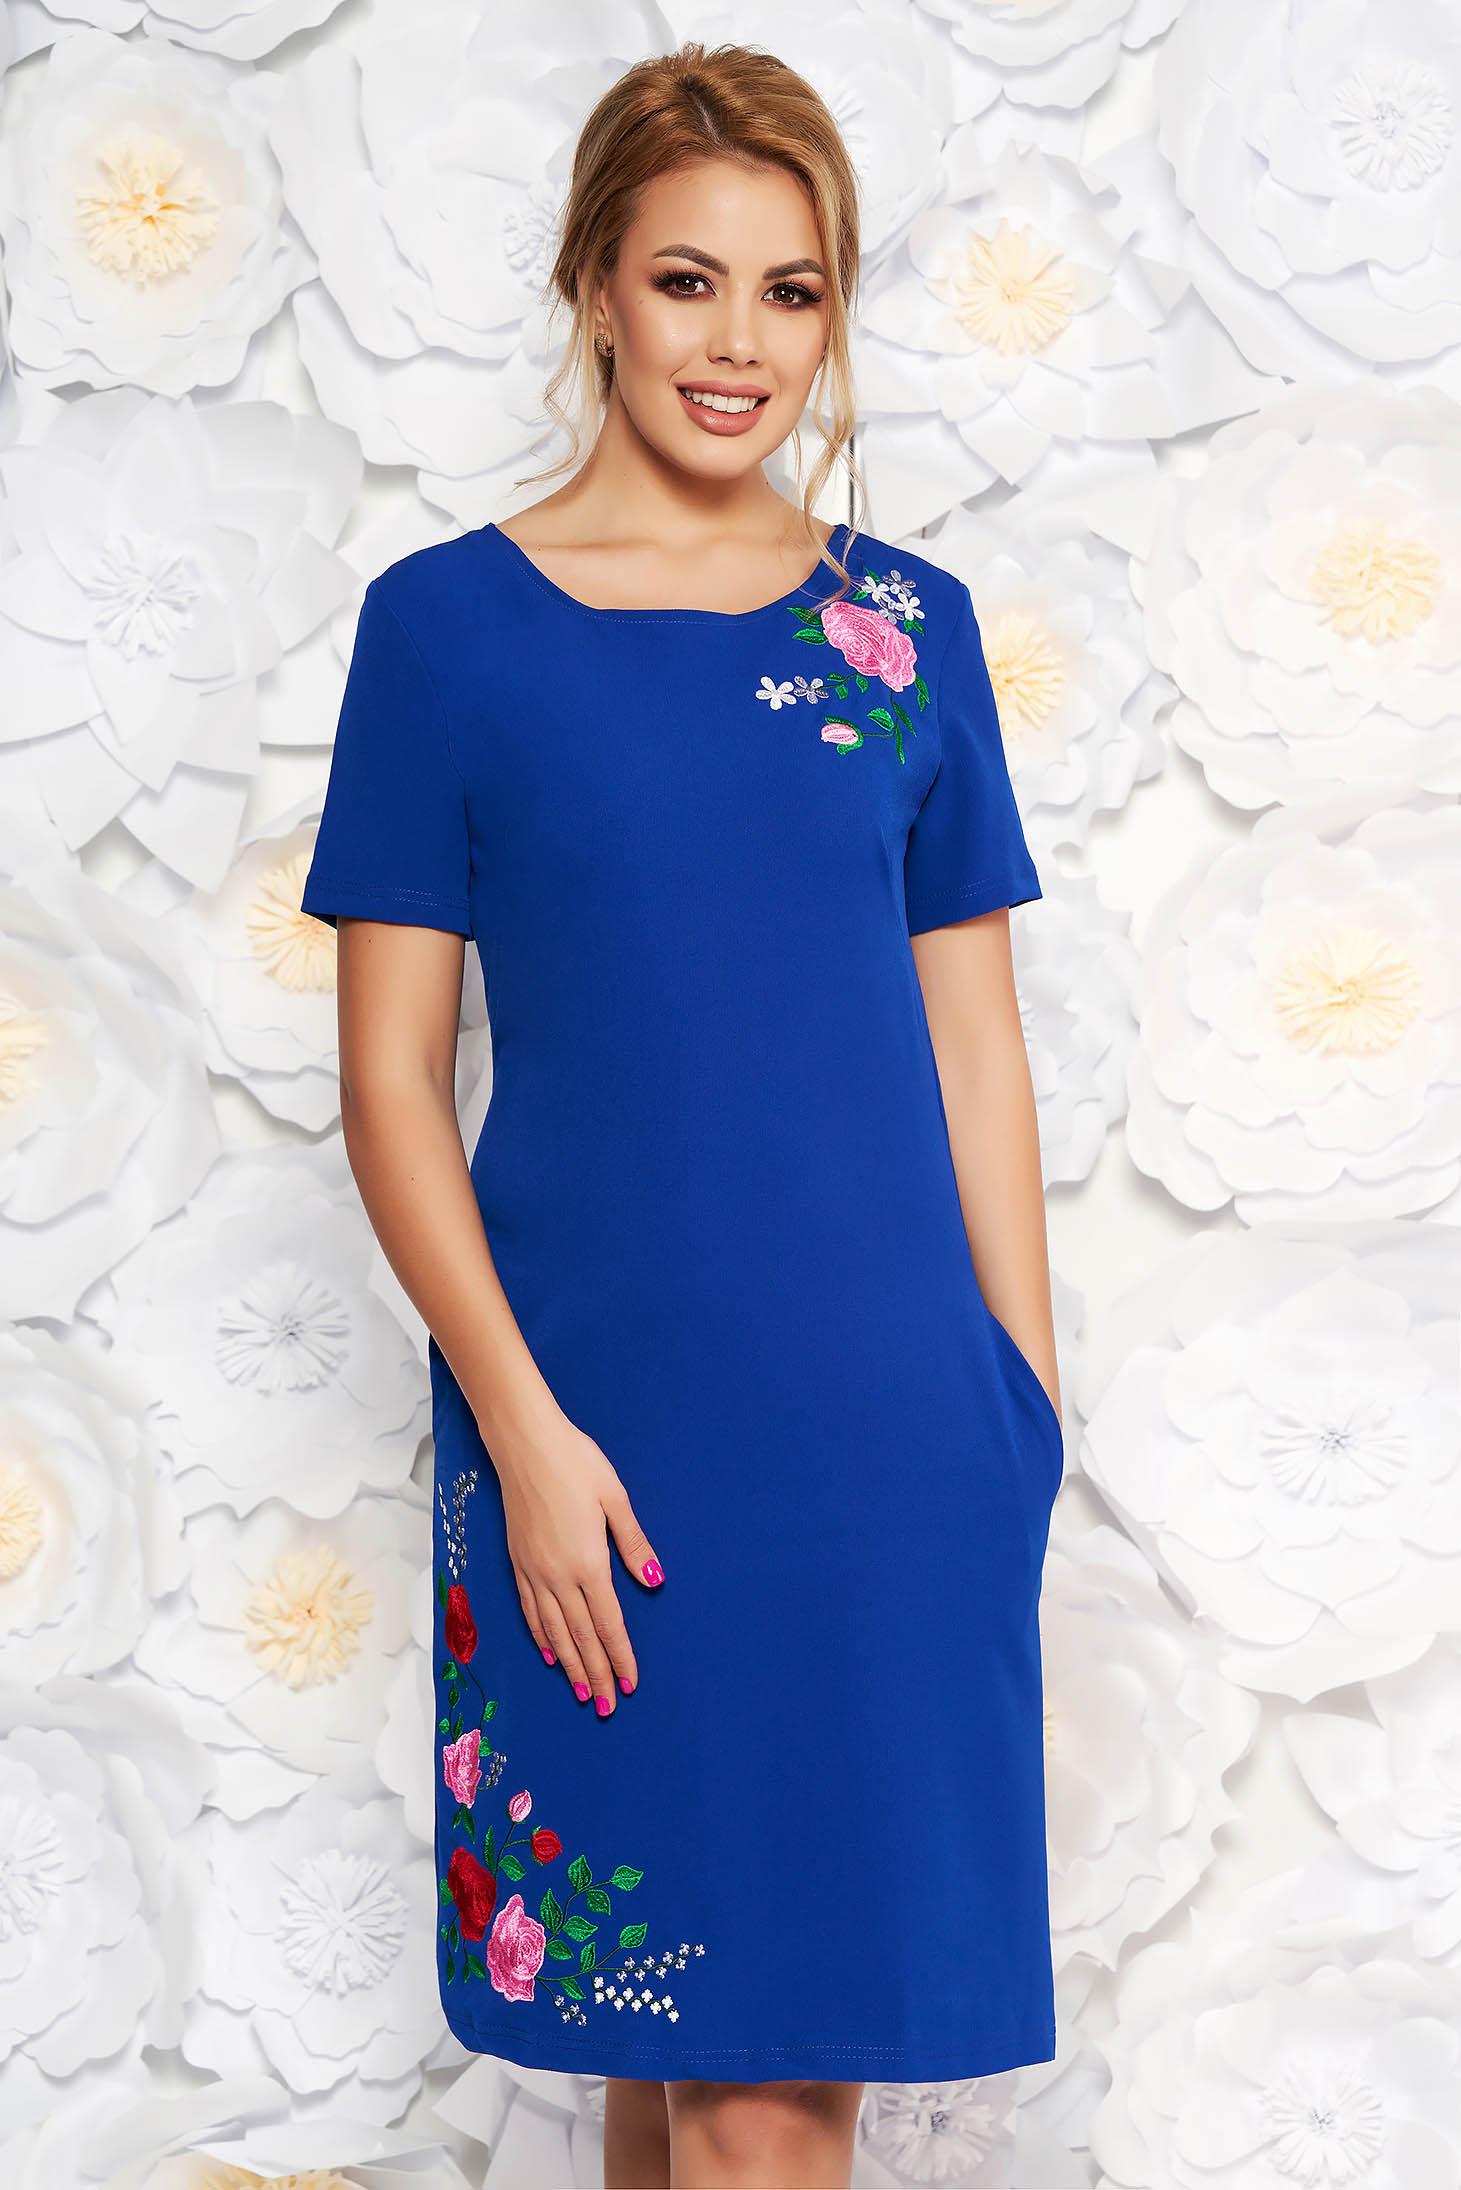 Rochie SunShine albastra de zi cu un croi drept din material elastic cu insertii de broderie